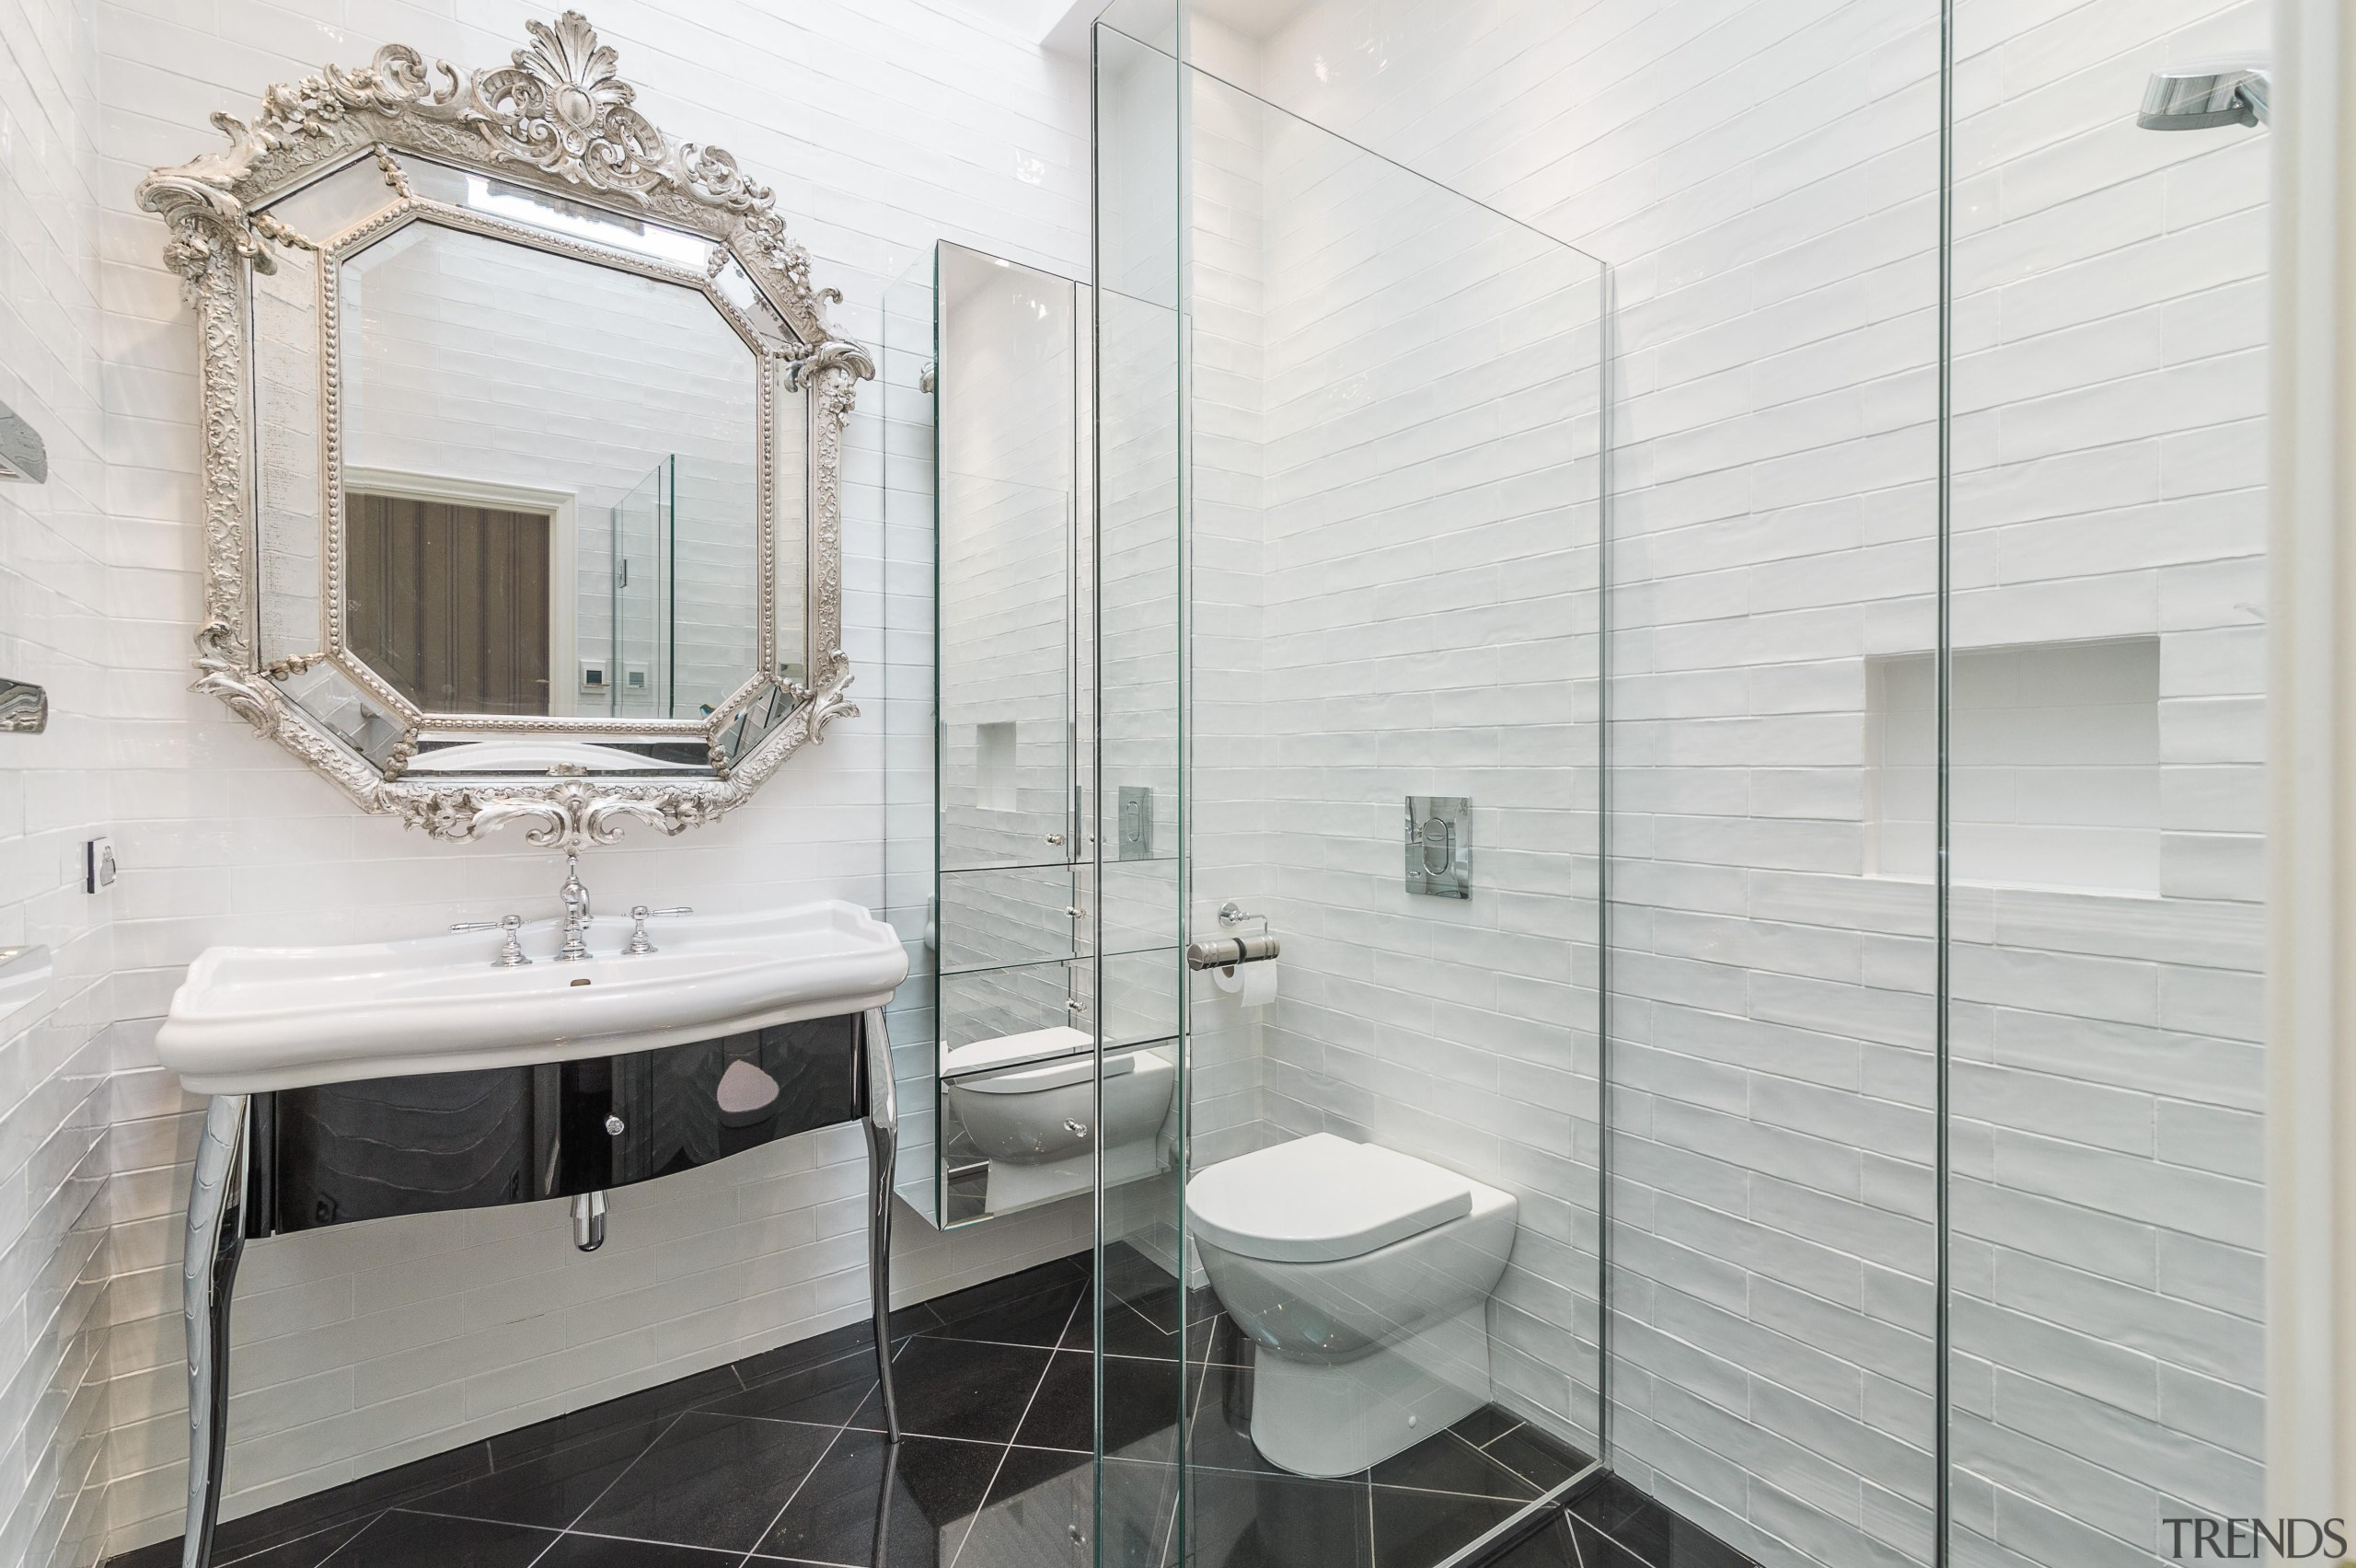 Emma Morris of Eterno Design - Winner of bathroom, bathroom accessory, floor, home, interior design, room, tile, white, gray